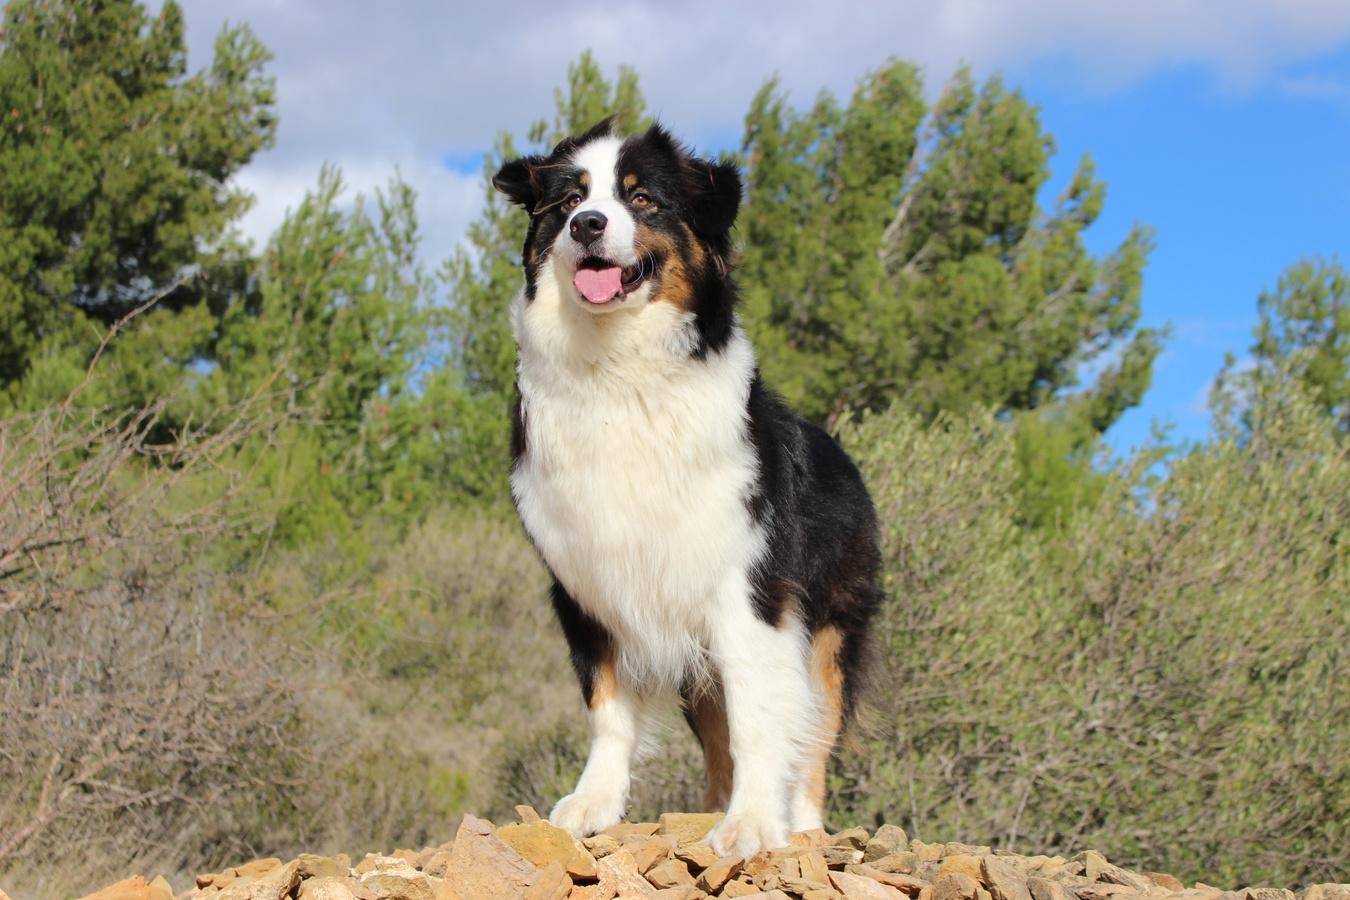 dog-mammal-border-collie-vertebrate-dog-breed-australian-shepherd-38409-pxhere.com_